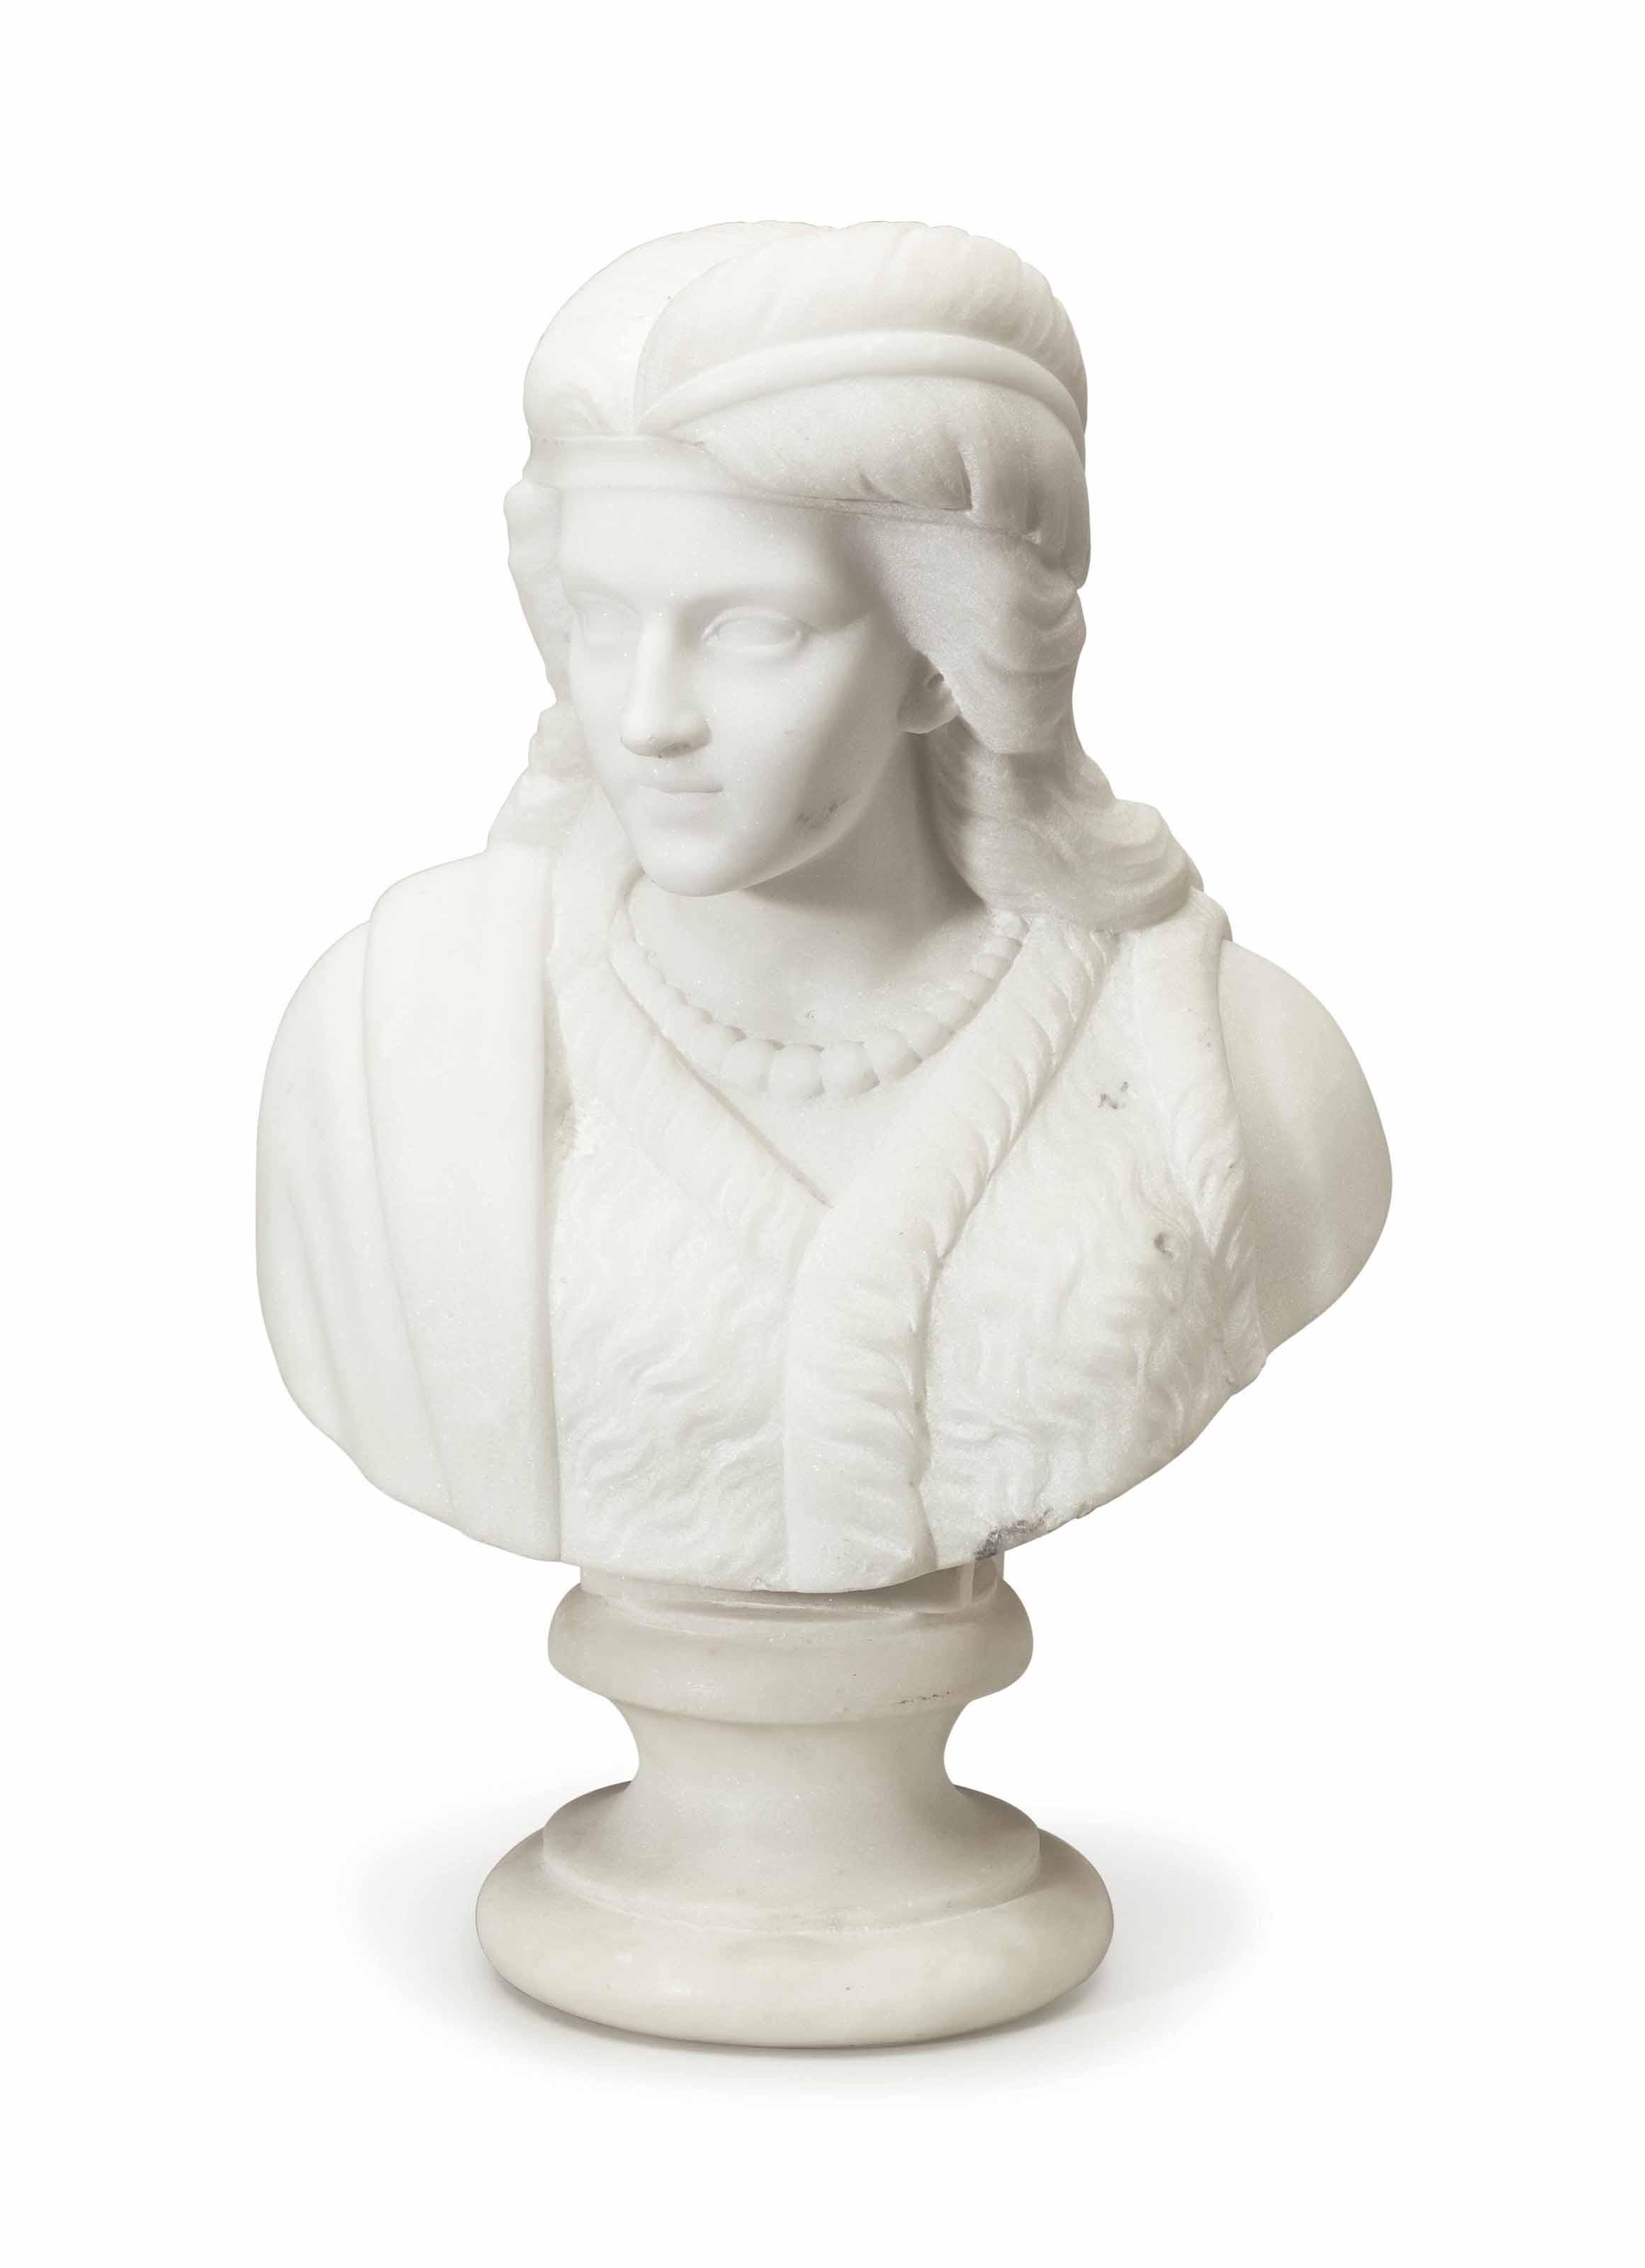 Edmonia Lewis (1845-after 1911)